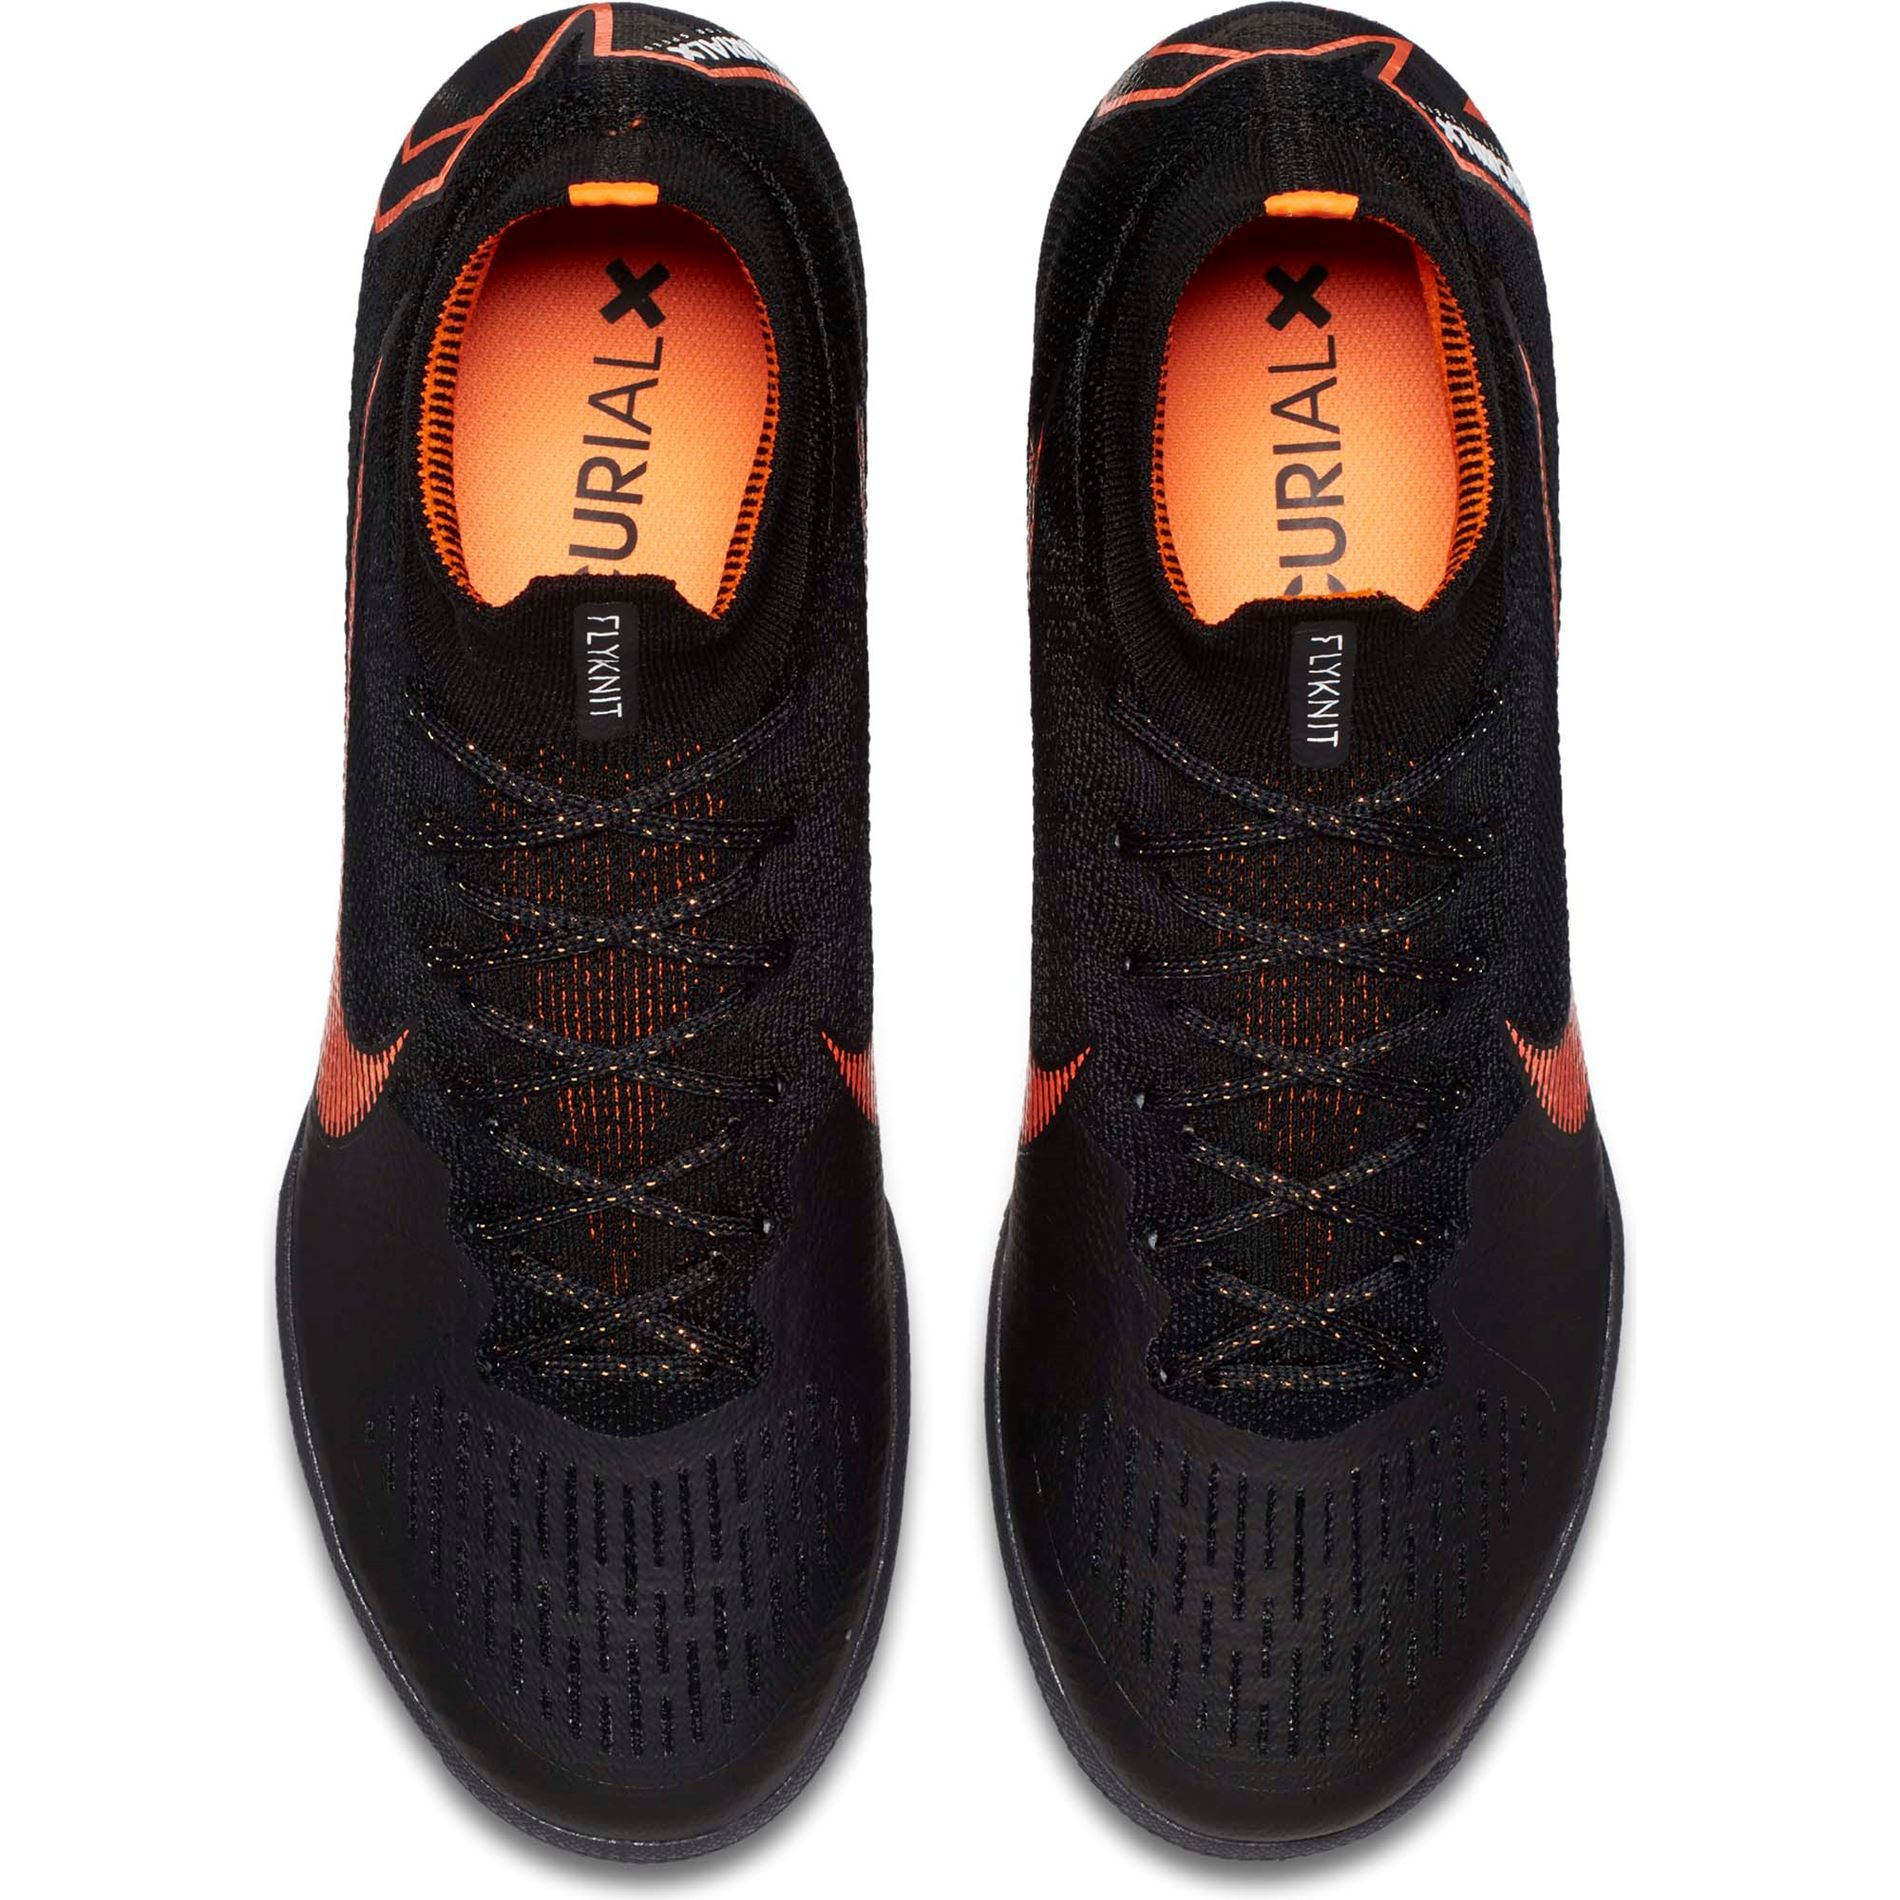 9668d420c0f Nike MercurialX Superfly 360 Elite TF Fast AF- Fotballsko.no - Sko fra  Adidas